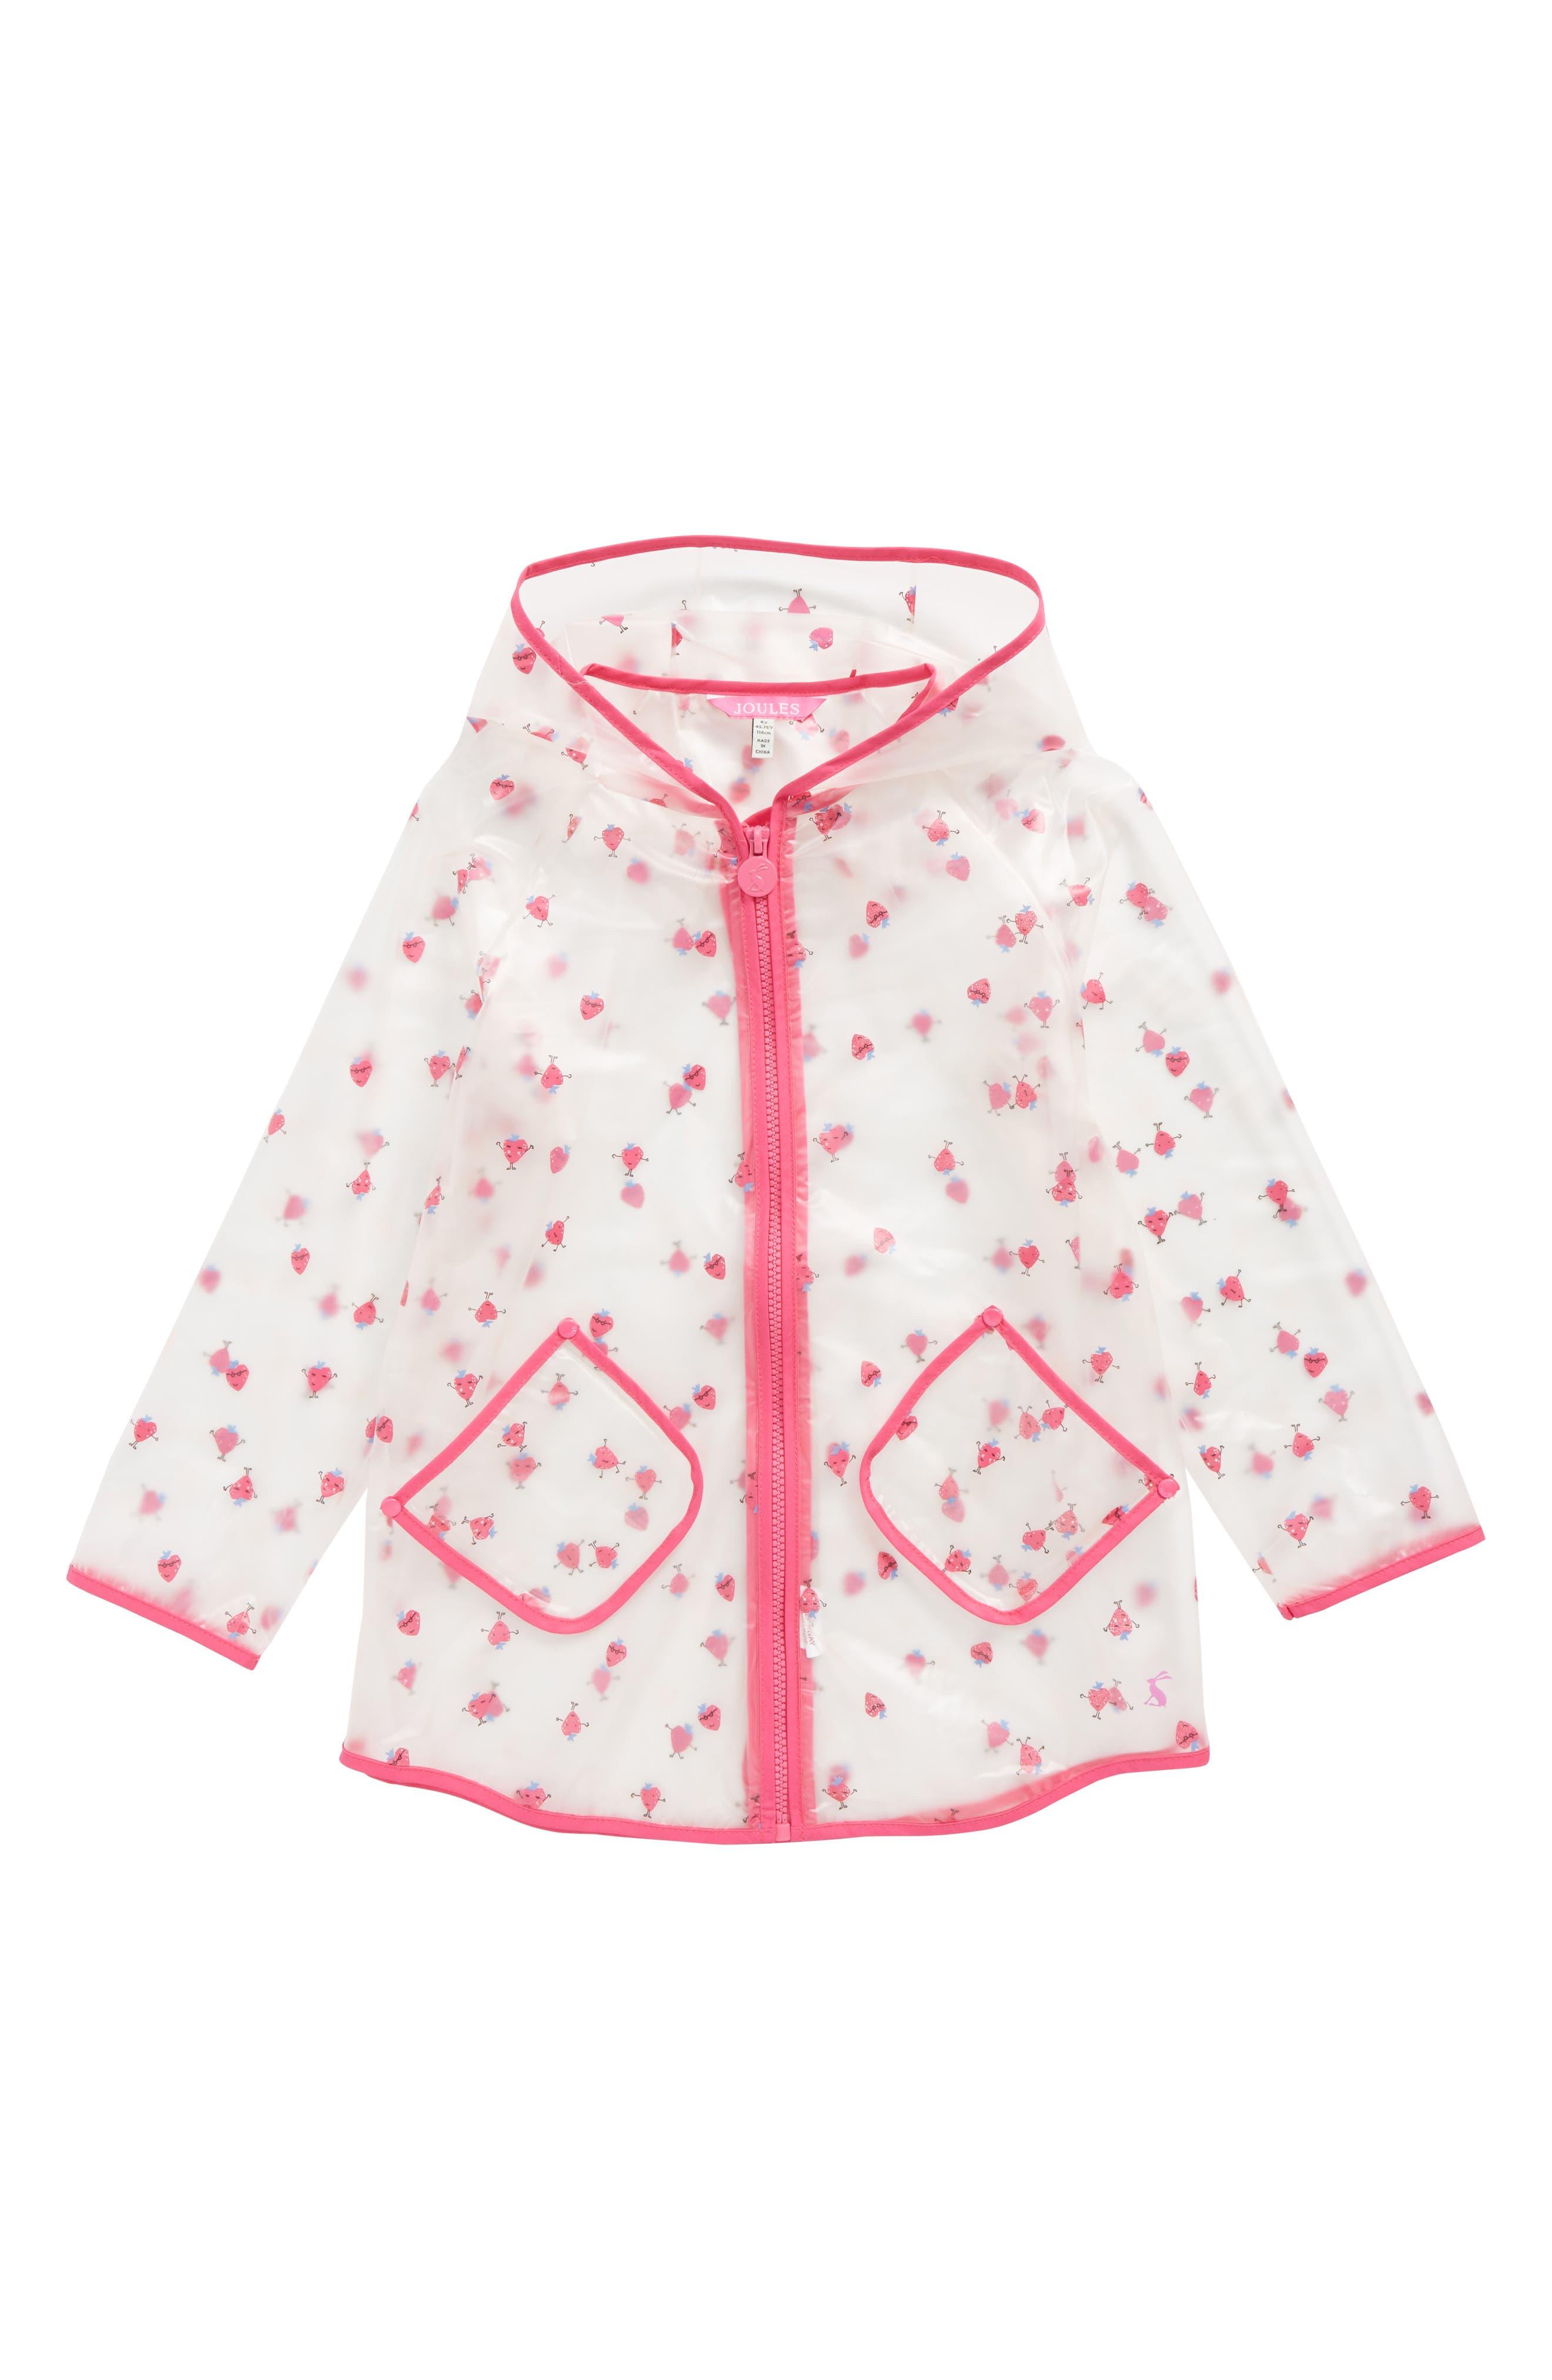 Print Sheer Rain Coat,                         Main,                         color, Strawberry Spot